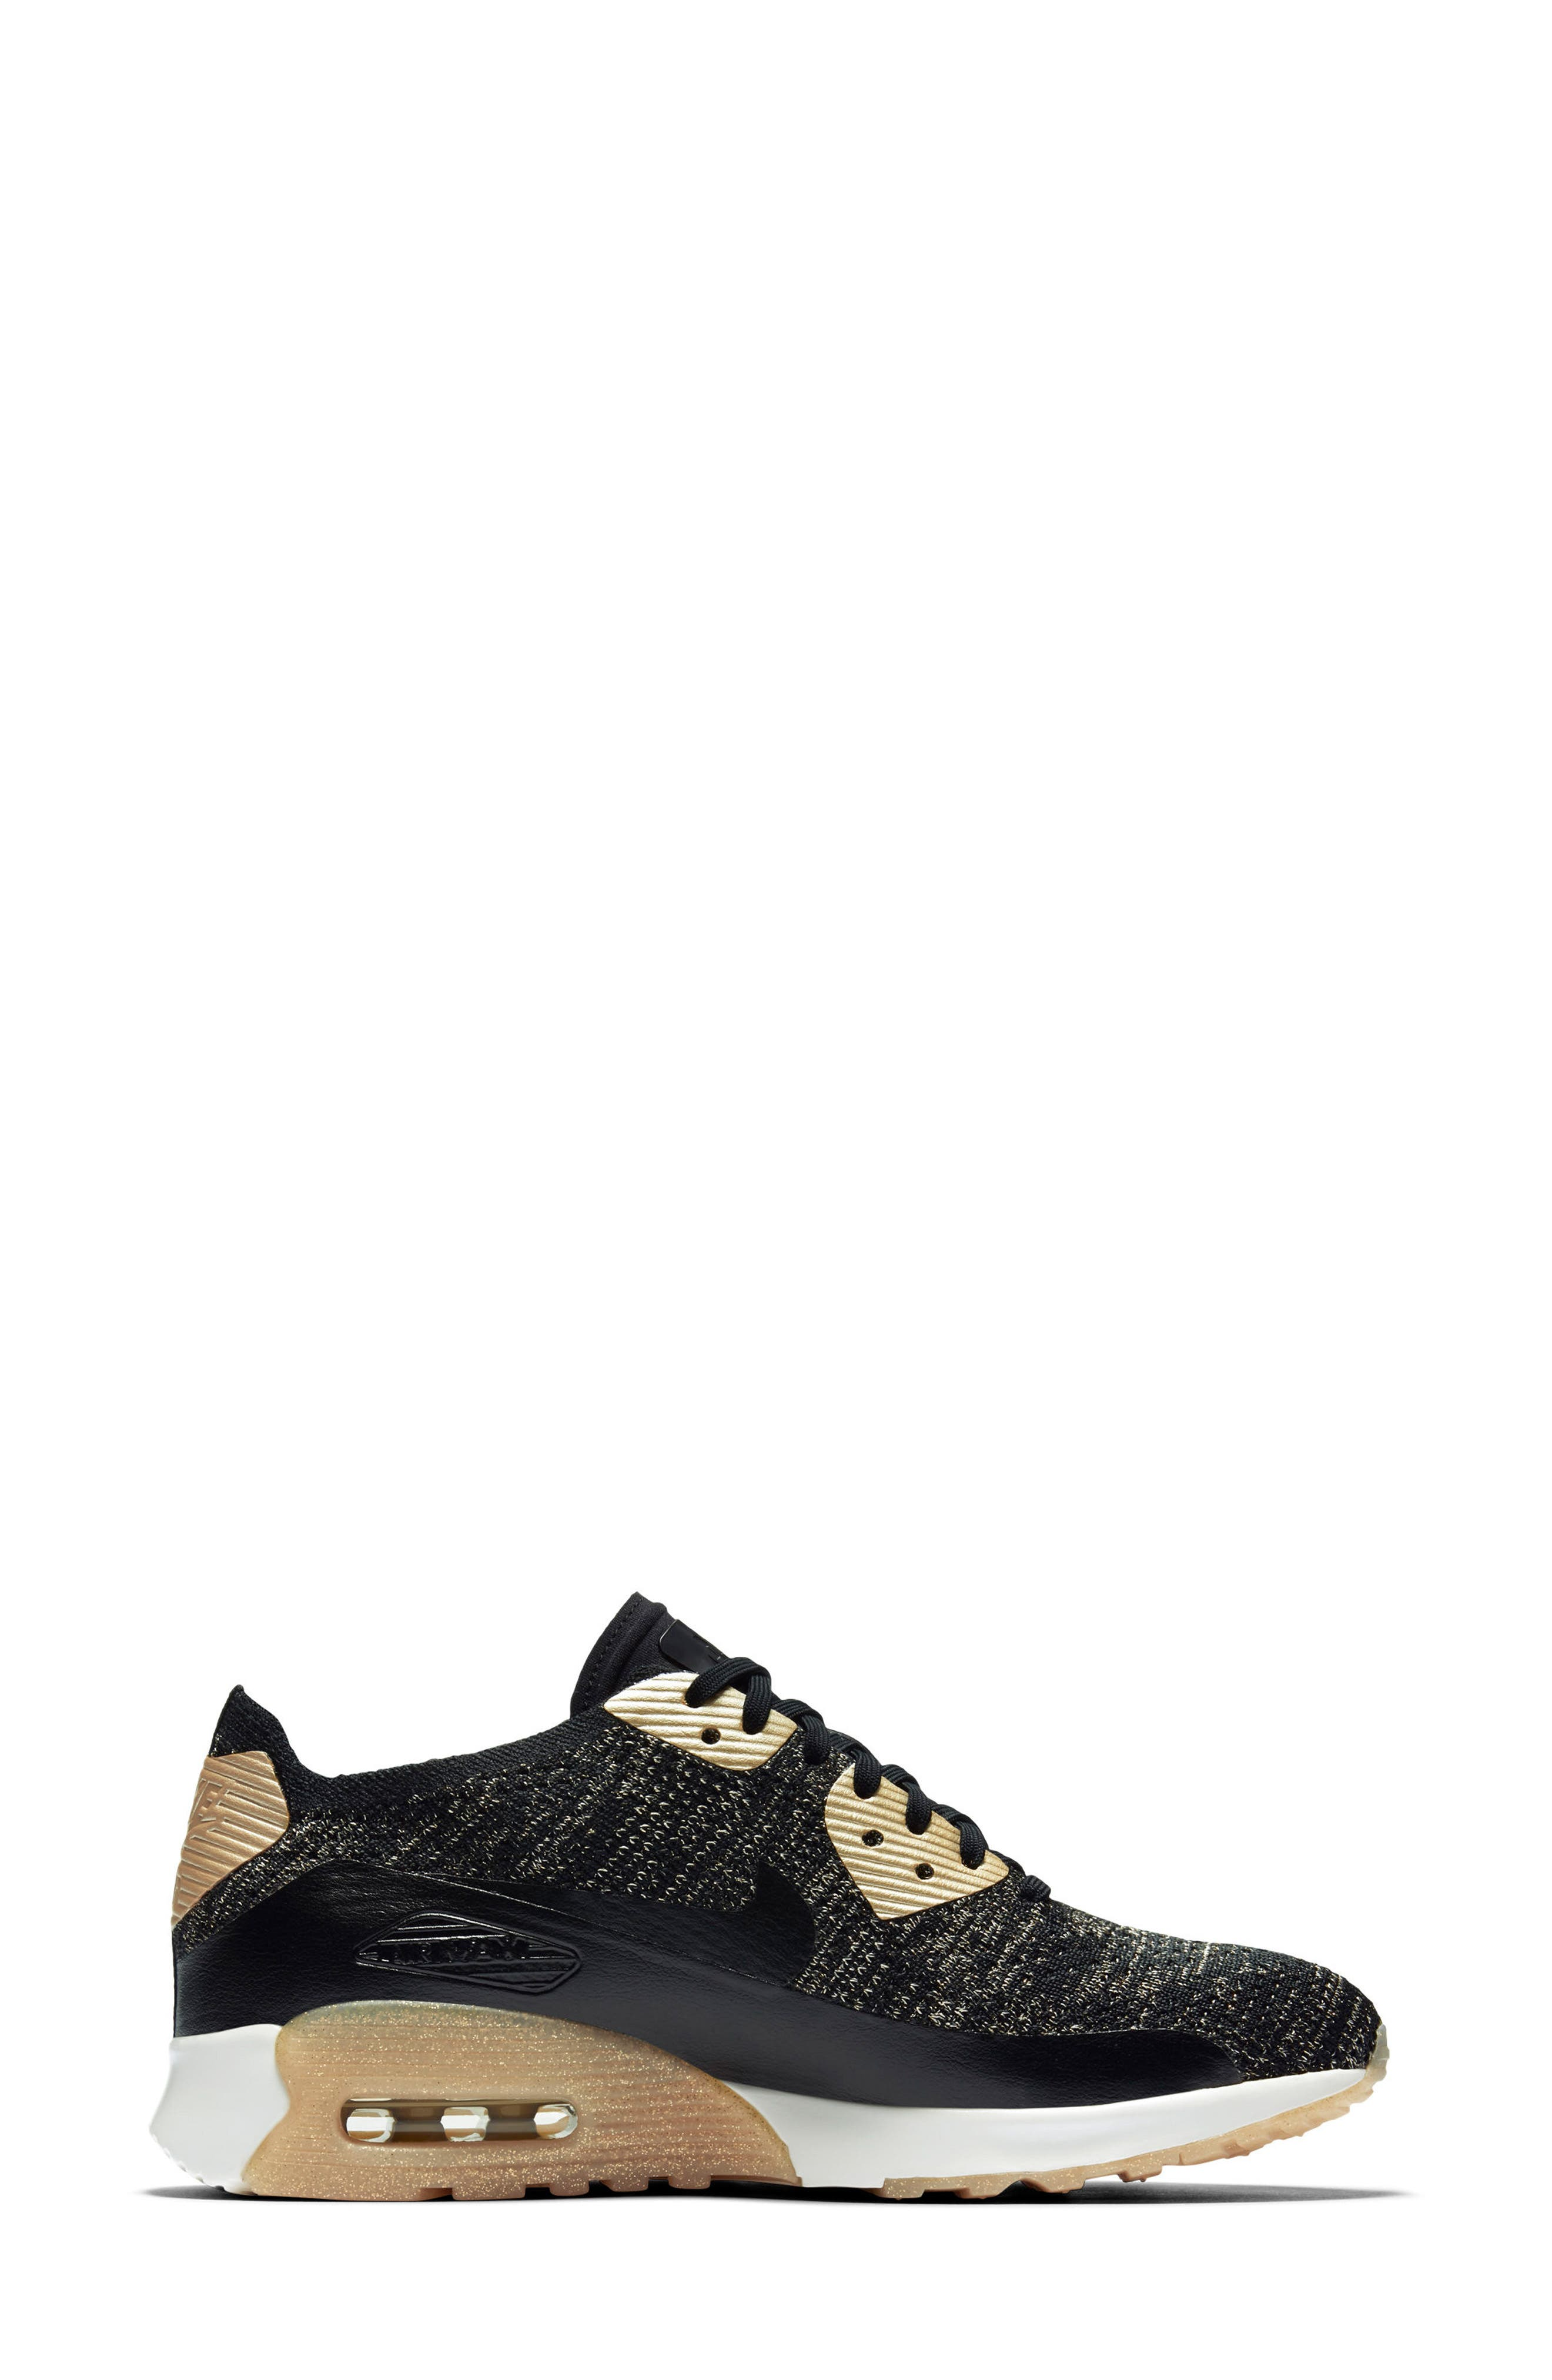 Air Max 90 Ultra 2.0 Flyknit Metallic Sneaker,                             Alternate thumbnail 3, color,                             001